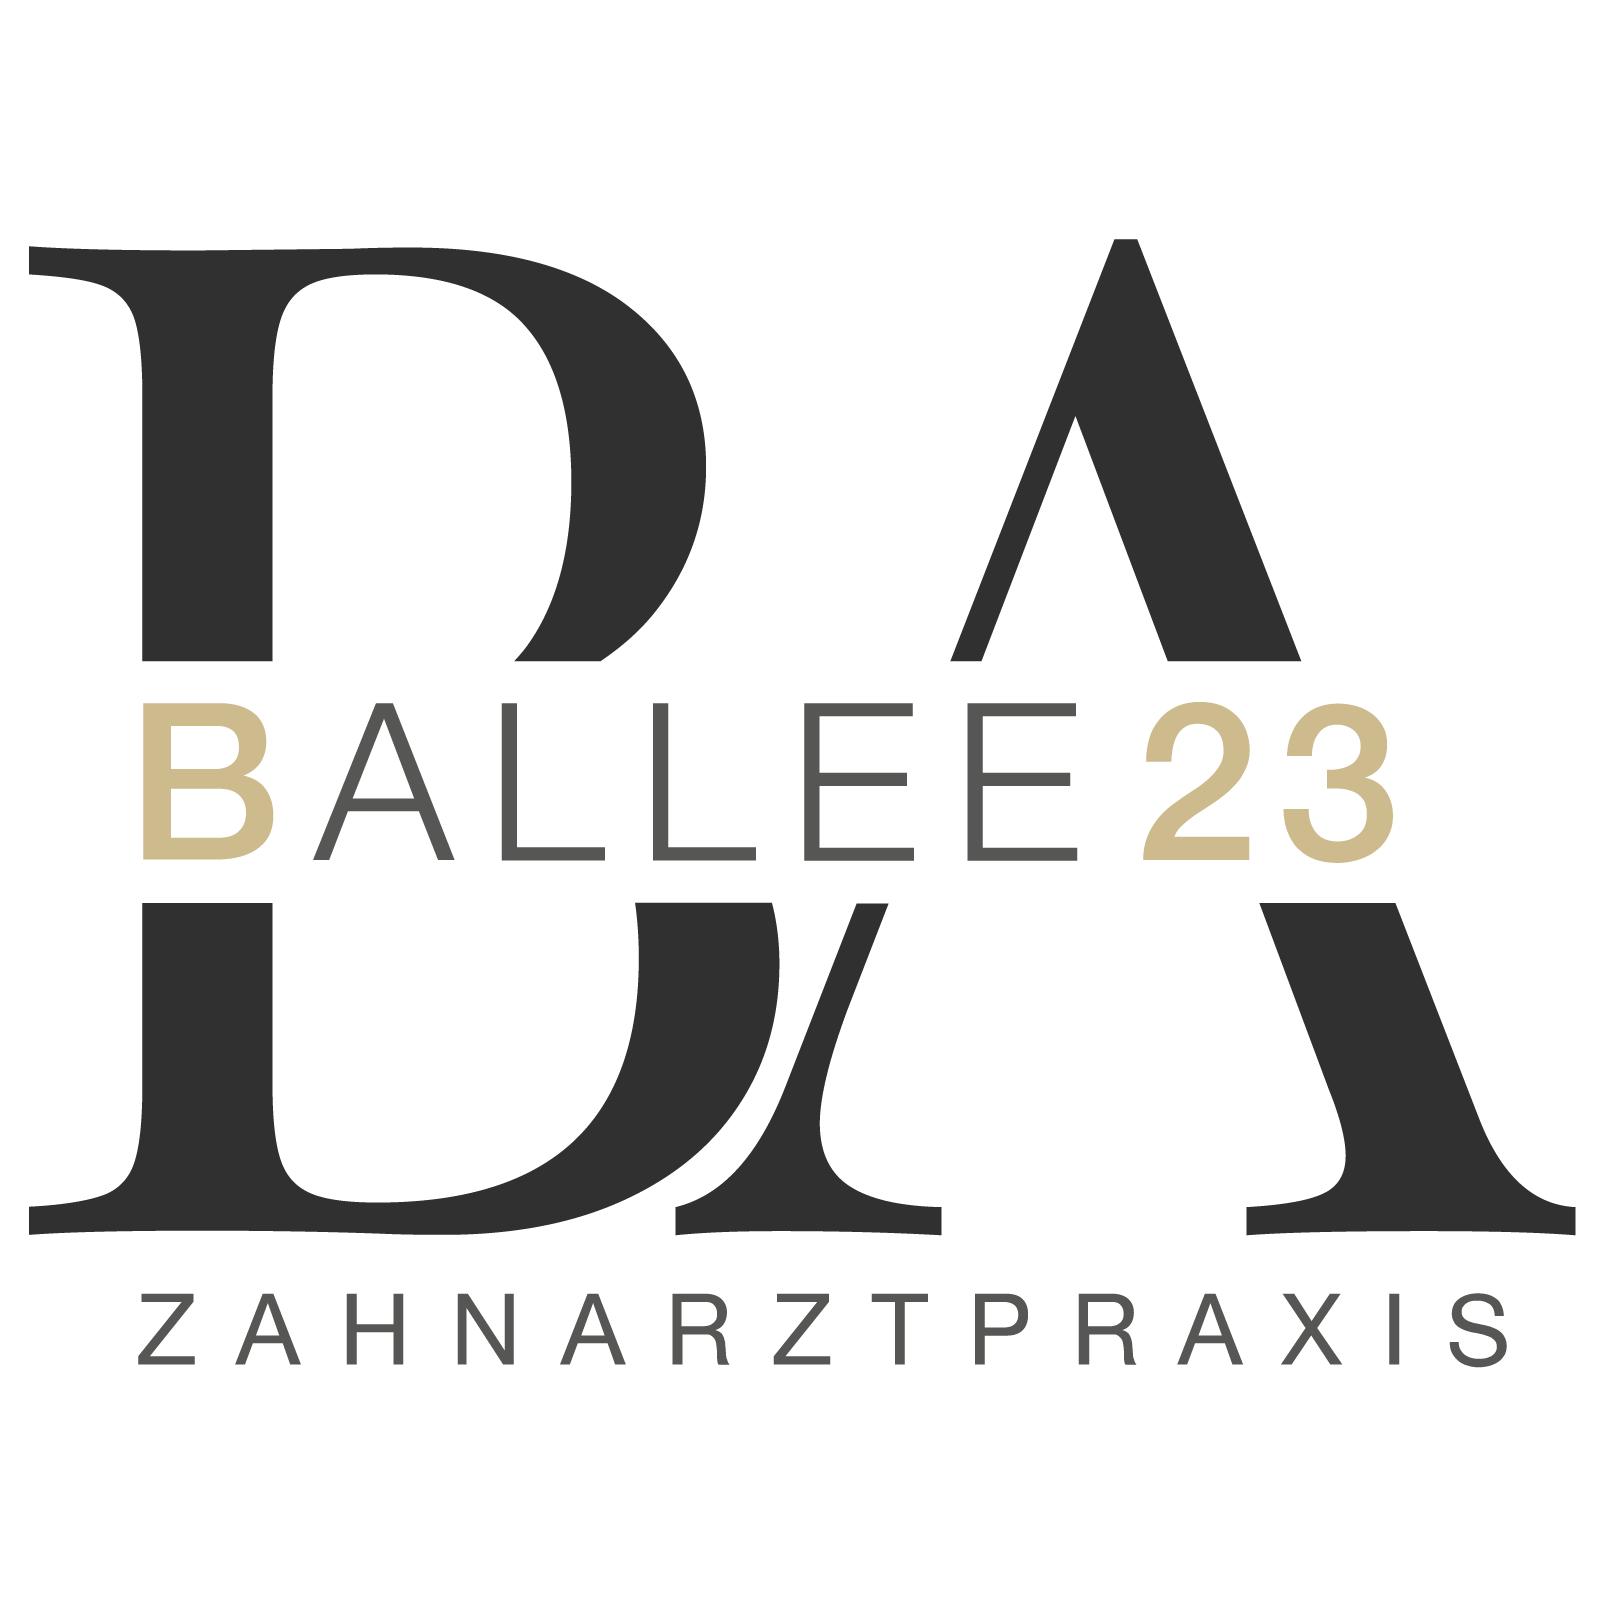 BALLEE23